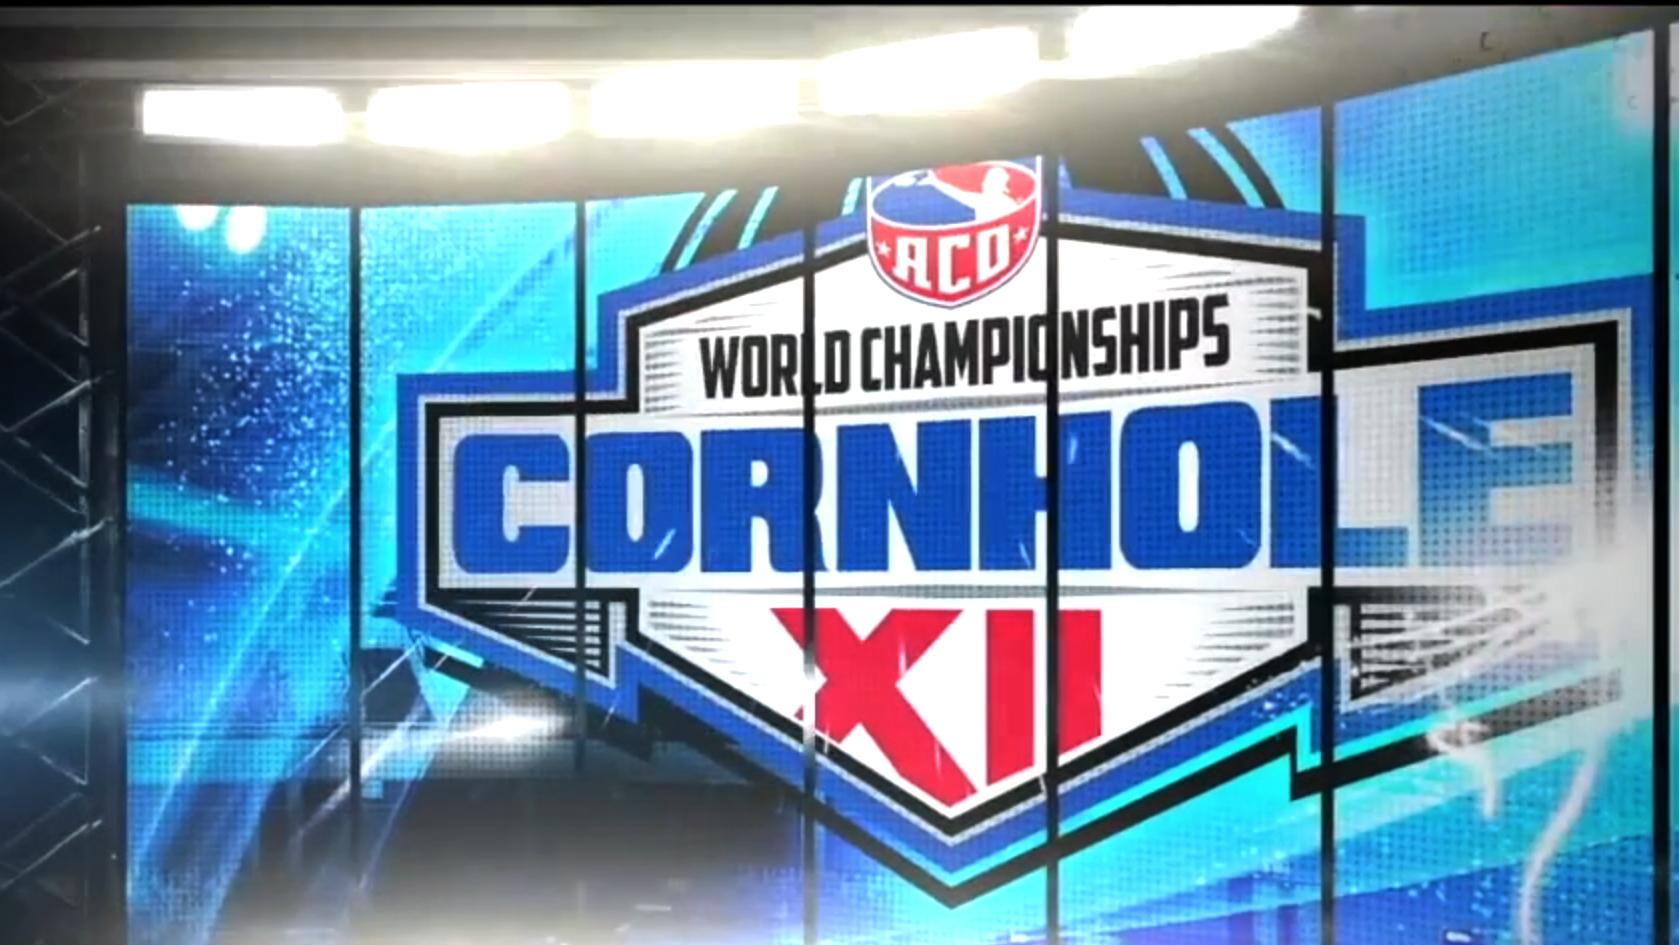 World Championship of Cornhole XII